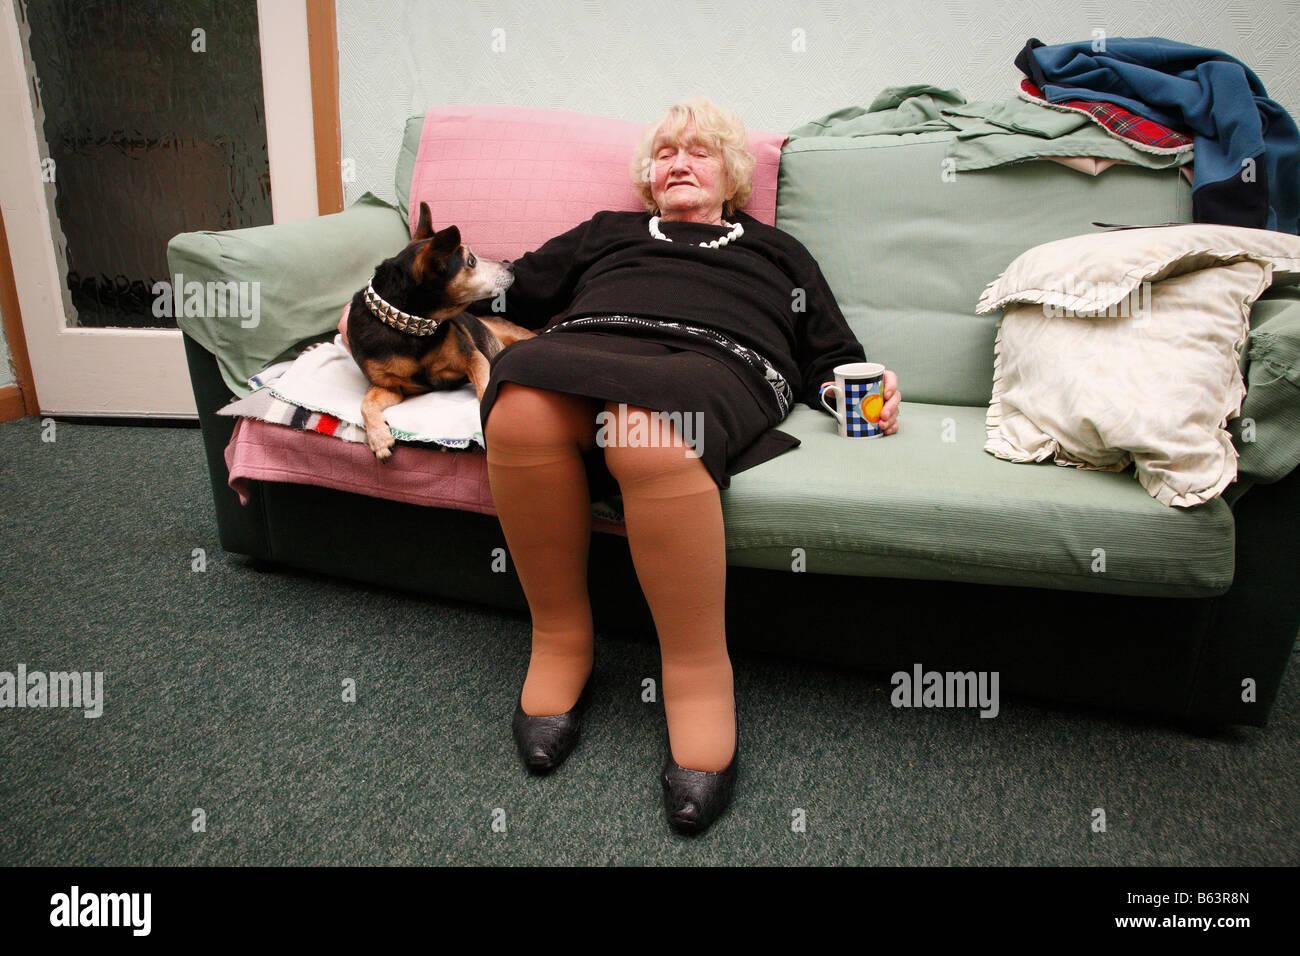 Old Woman Asleep On The Sofa With Dog Stock Photo 20982437 Alamy